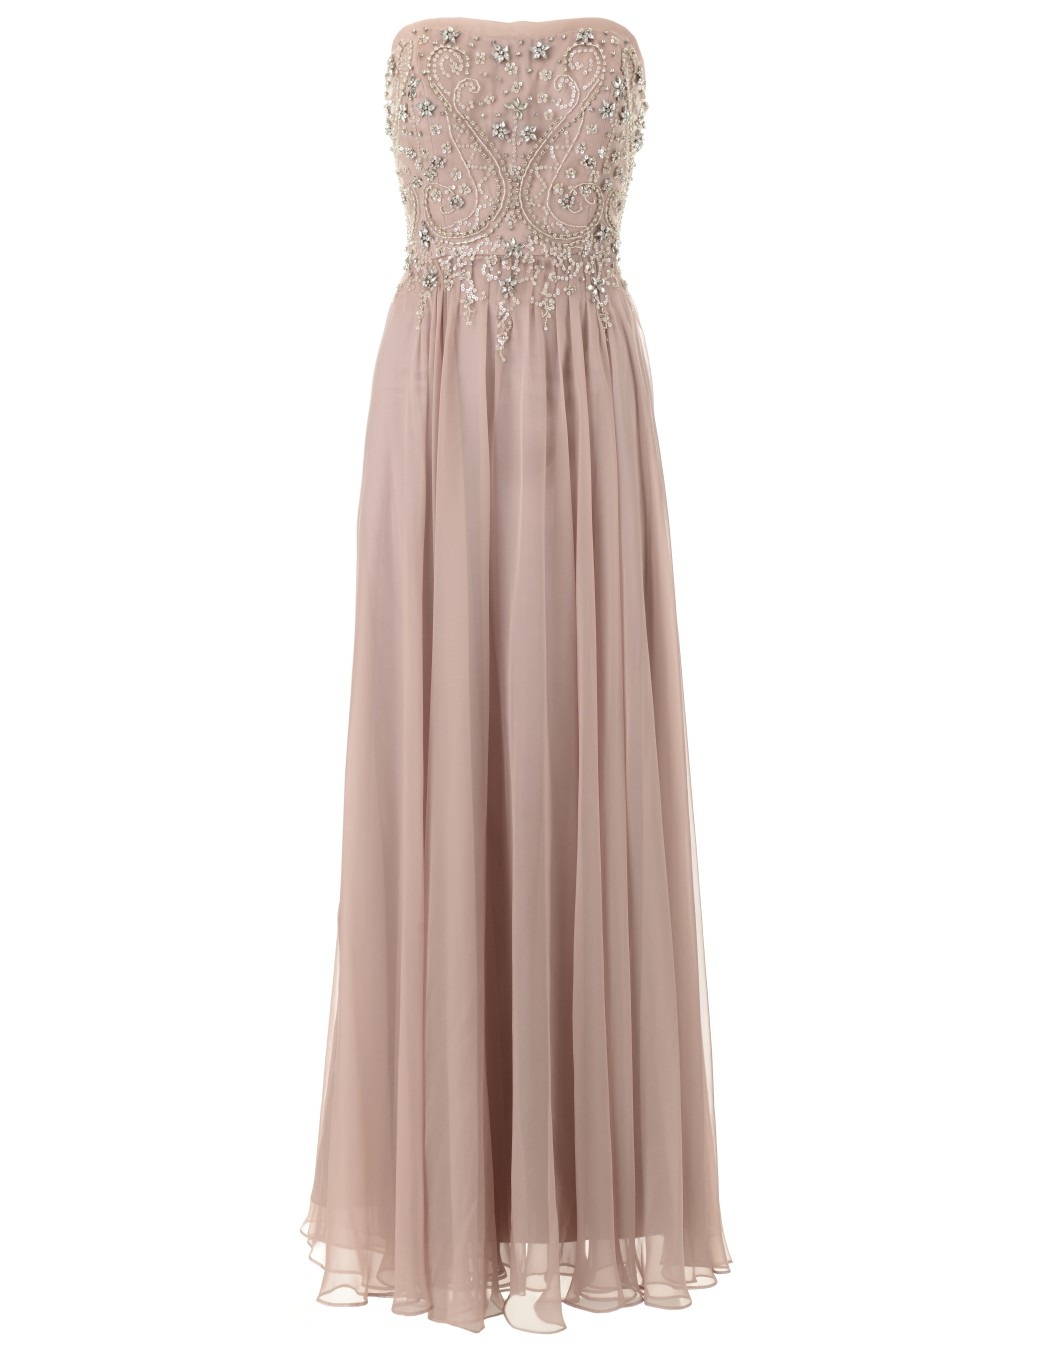 Classic Wedding Invitations Bridesmaid Dress Designers